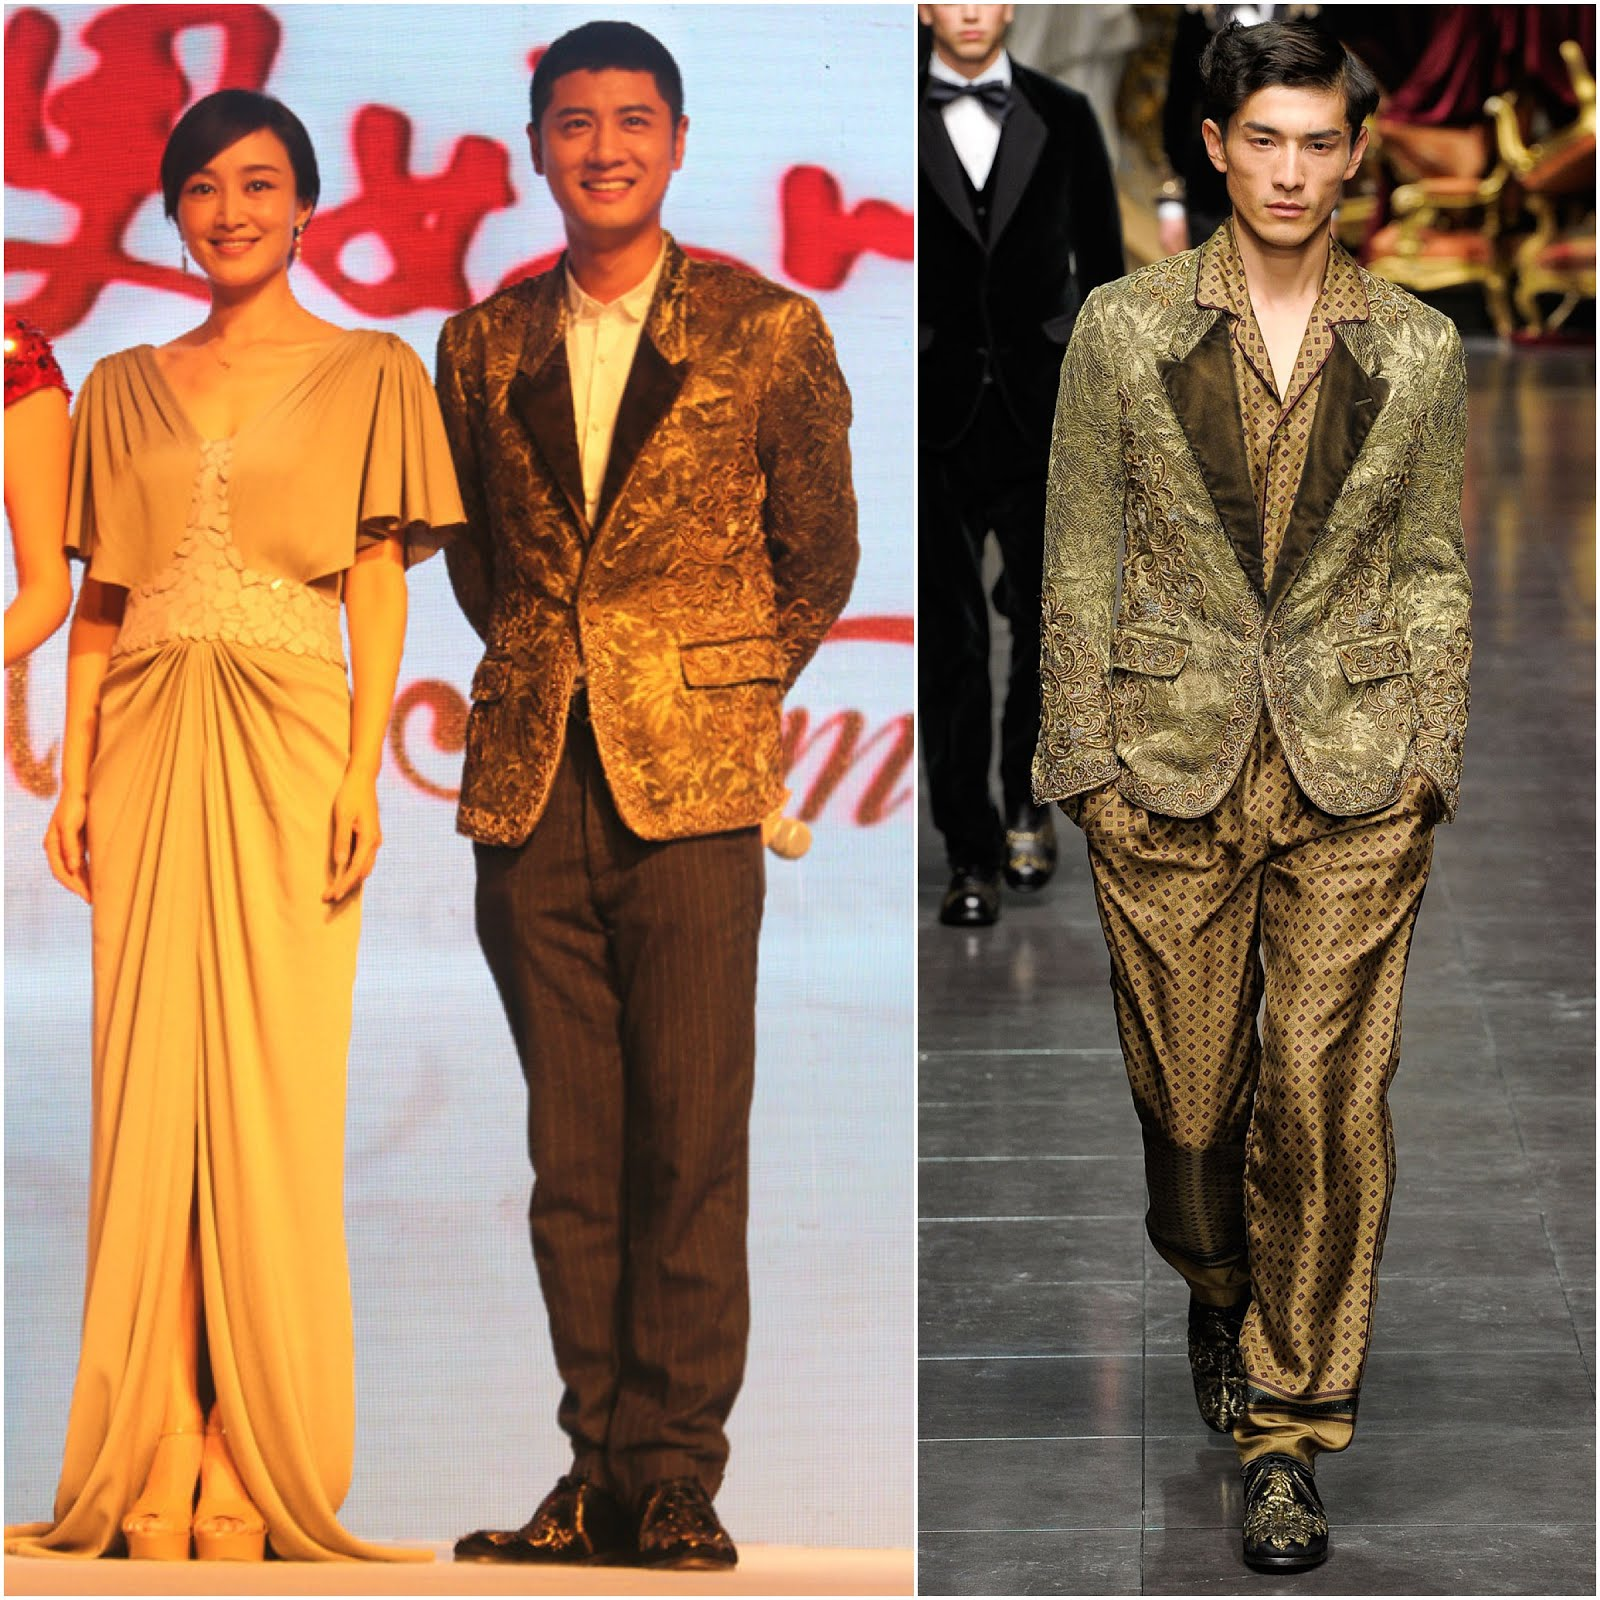 00O00 London Menswear Blogger Celebrity Style Ren Zhong in Dolce & Gabbana / 【任重受邀出席时尚活动,身穿杜嘉班纳华丽晚礼服夹克】